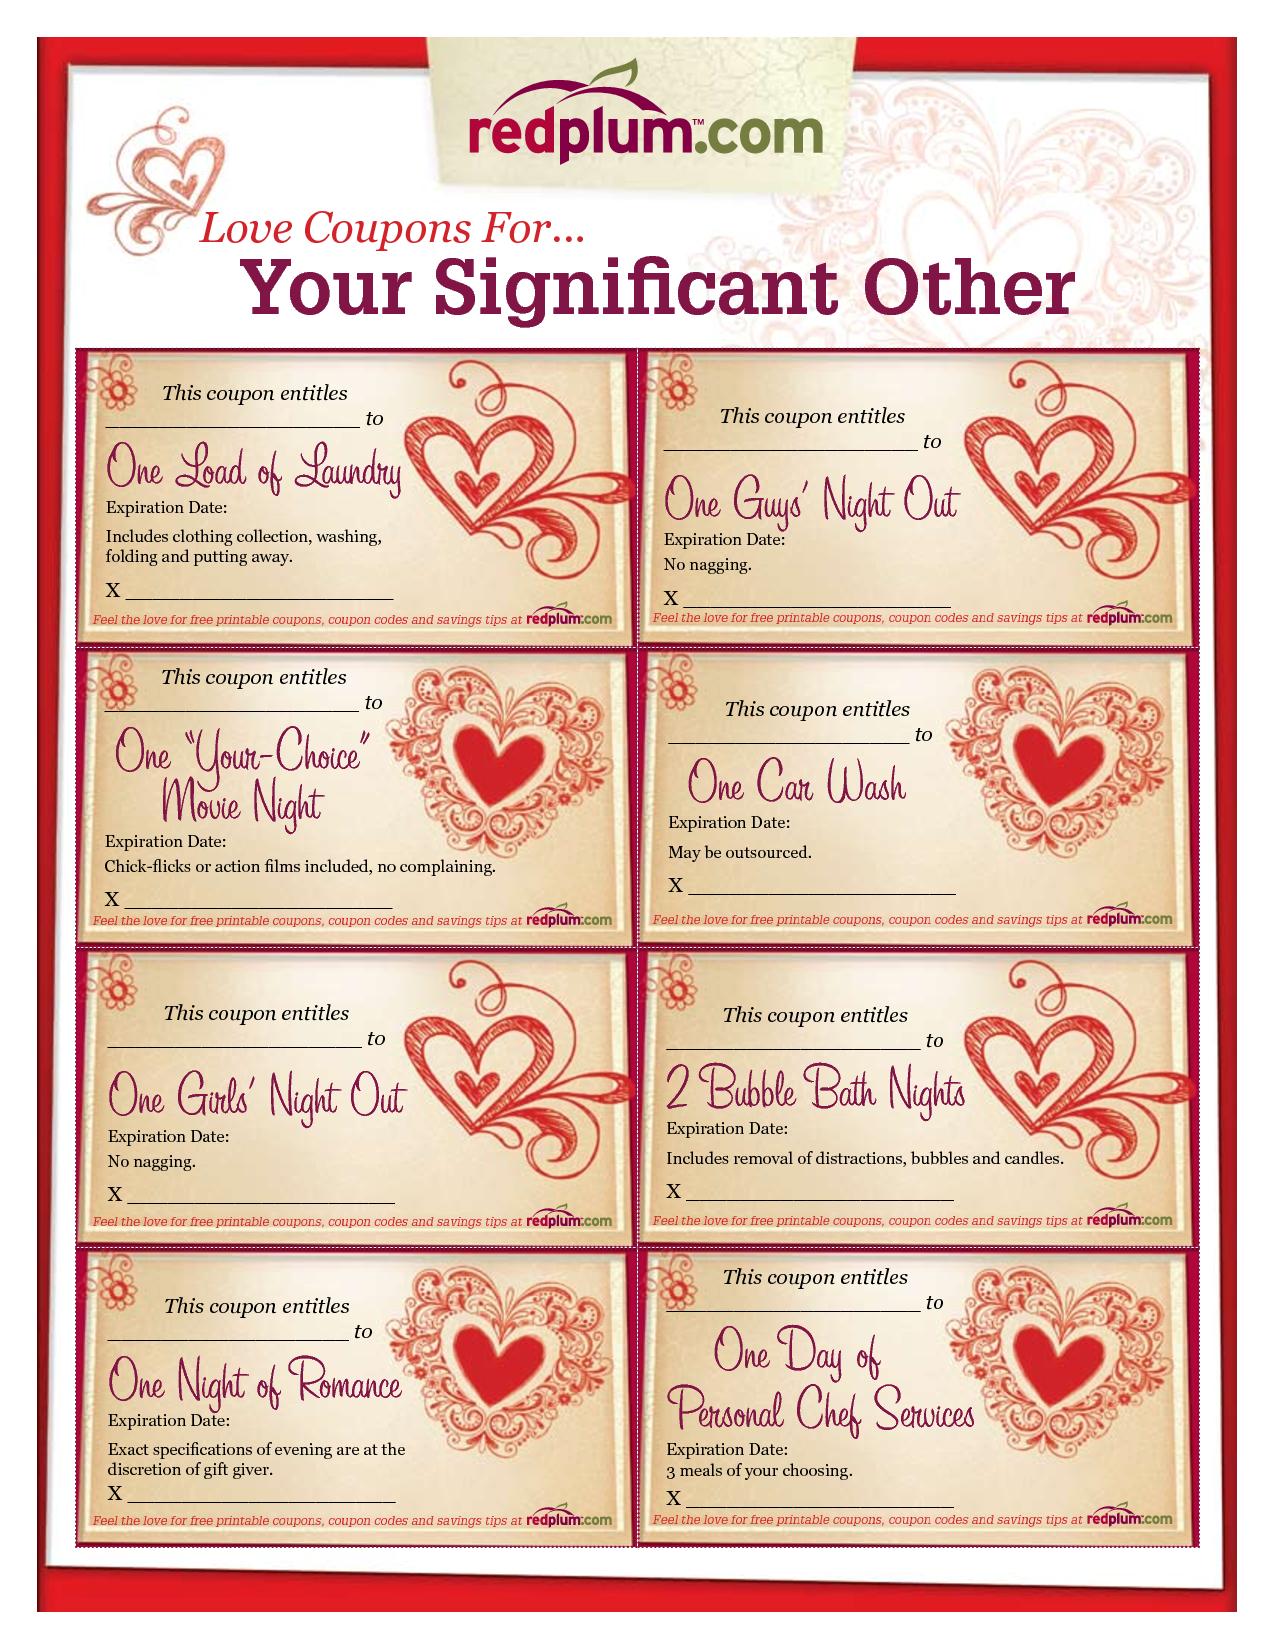 Romantic Love Coupon Template Printable | Love Coupons For Your - Free Printable Love Coupons